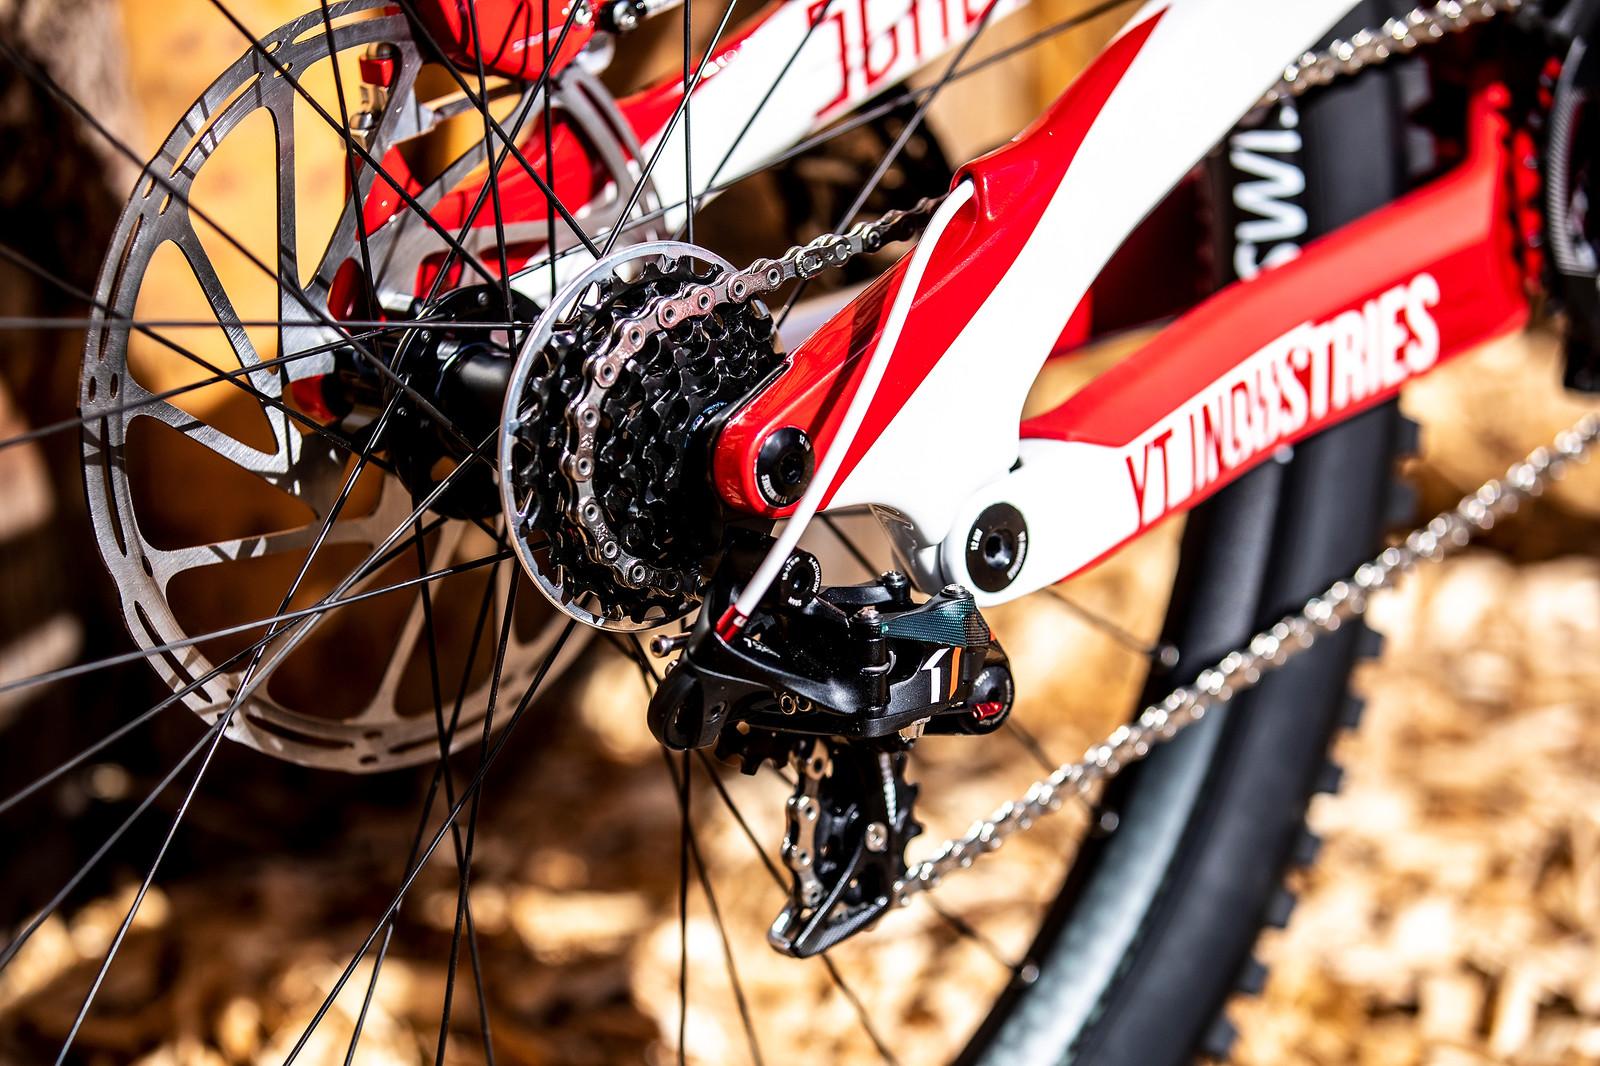 SRAM X0 DH Drivetrain - WORLD CHAMPS BIKE - Vali Holl's YT TUES - Mountain Biking Pictures - Vital MTB